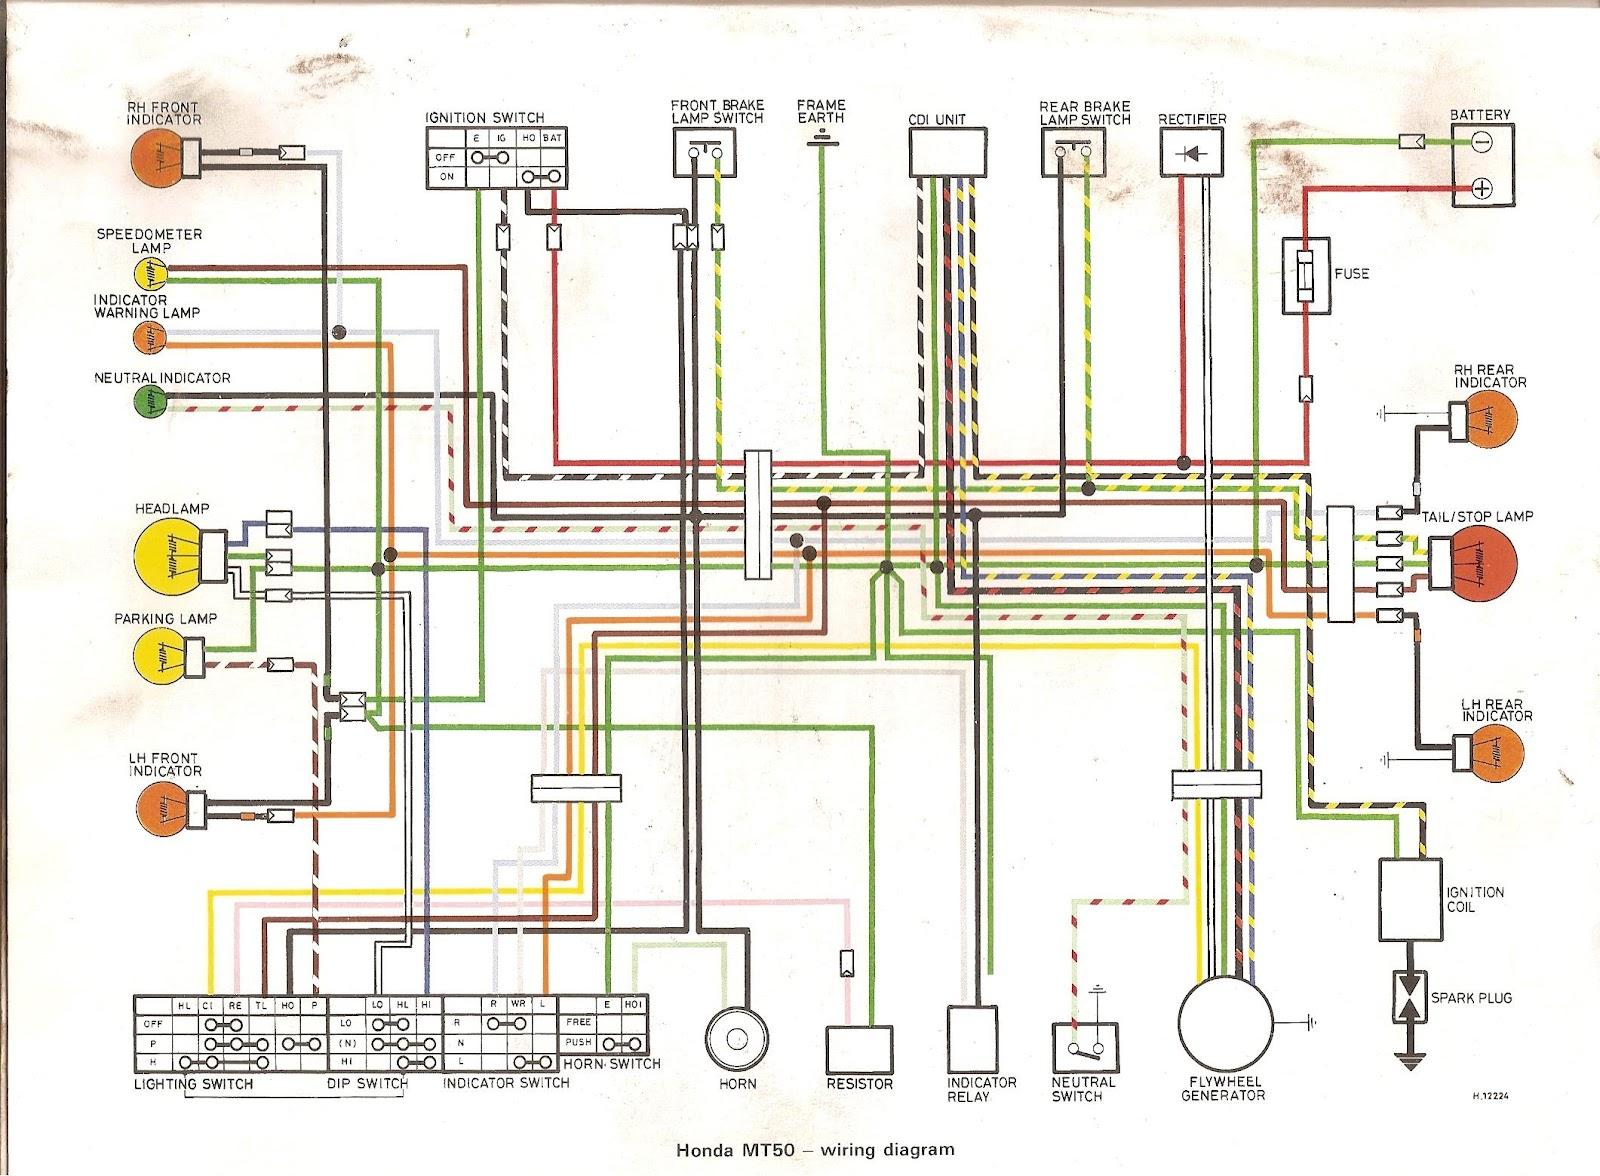 stunning 1982 honda mb5 wiring diagram pictures